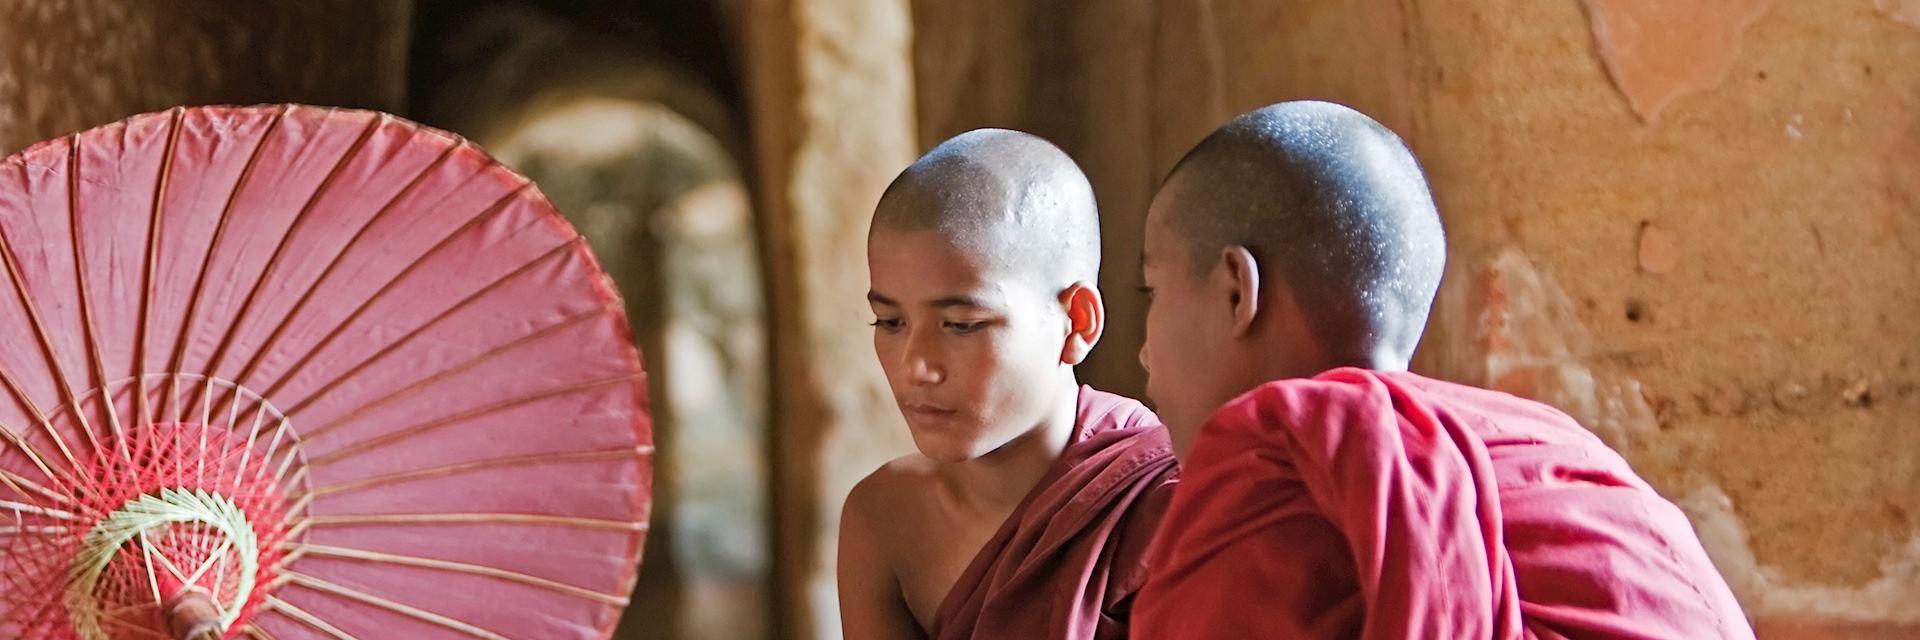 Buddhist monks, Cambodia